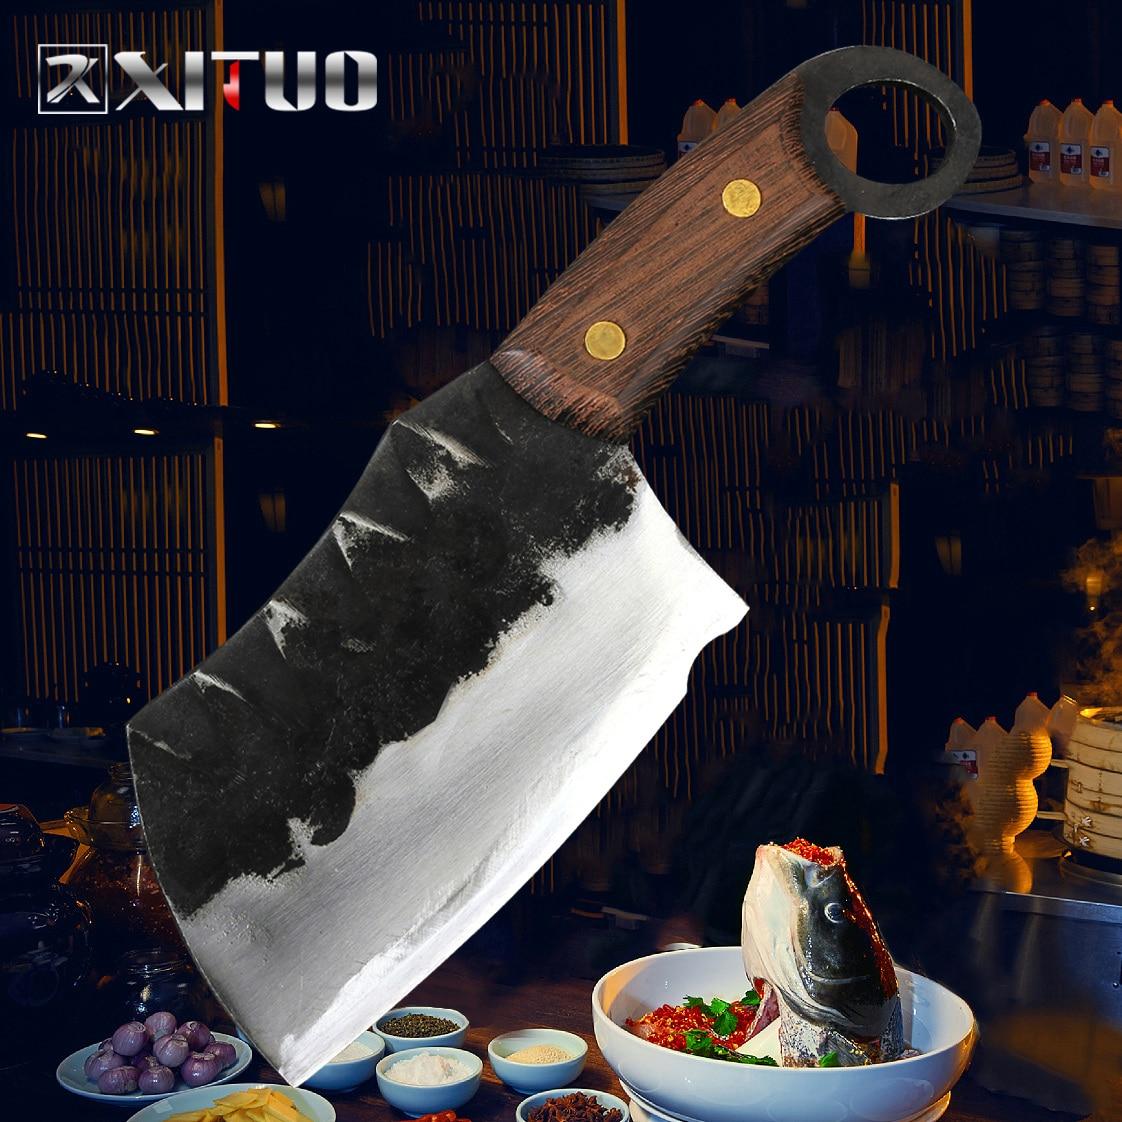 XITUO Handmade Knife Cleaver Forging Nakiri Japanese Clad-Steel High-Carbon Santoku Gyuto